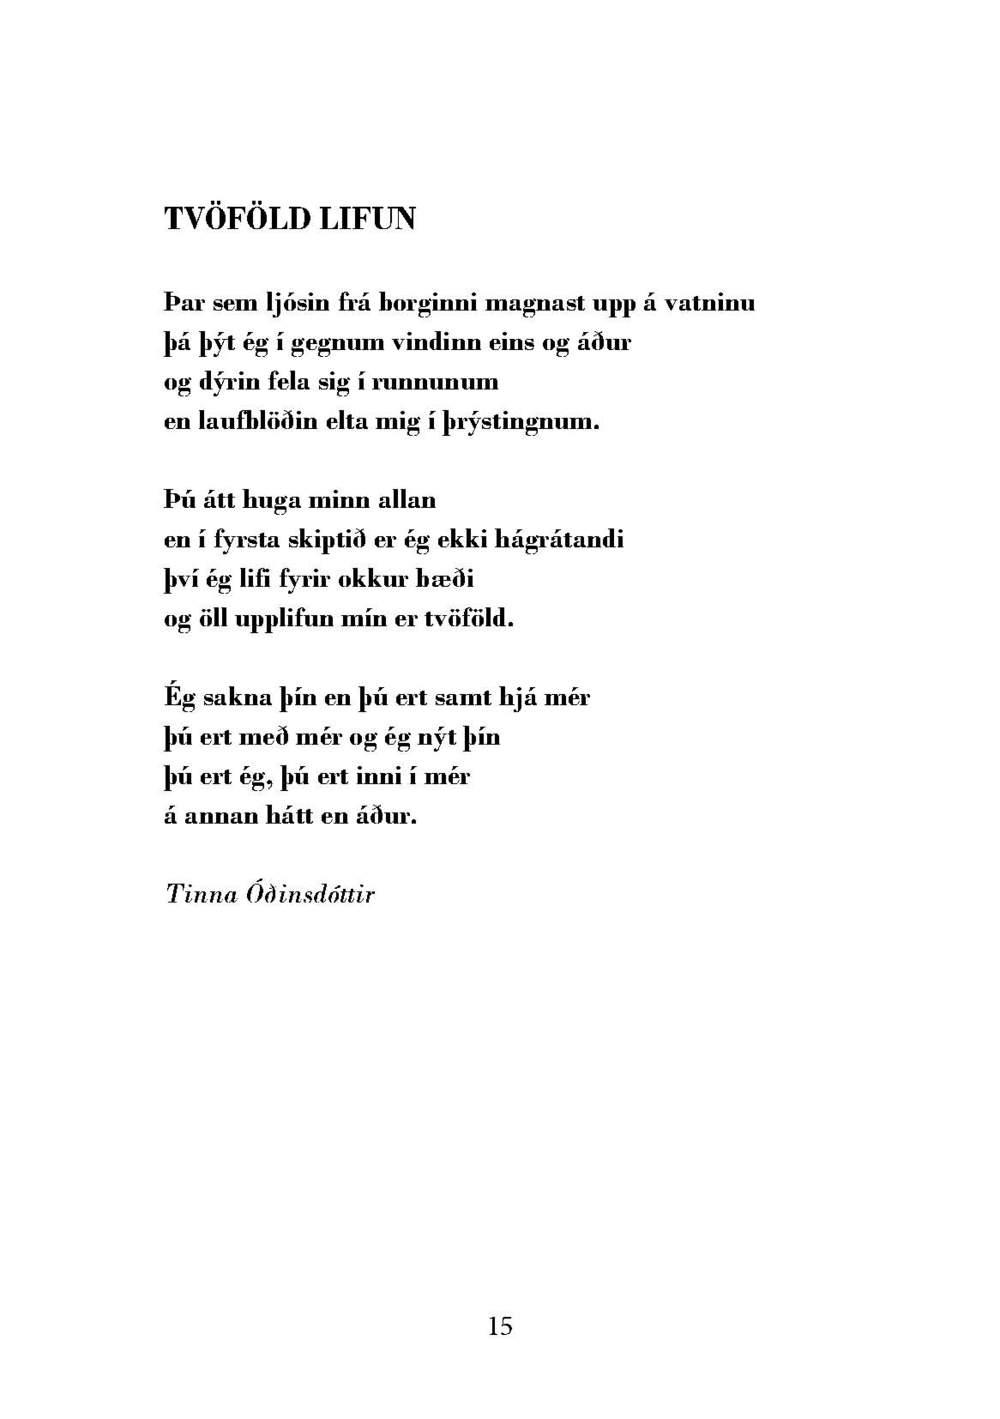 27073-ljodabokin--oll_Page_37.jpg